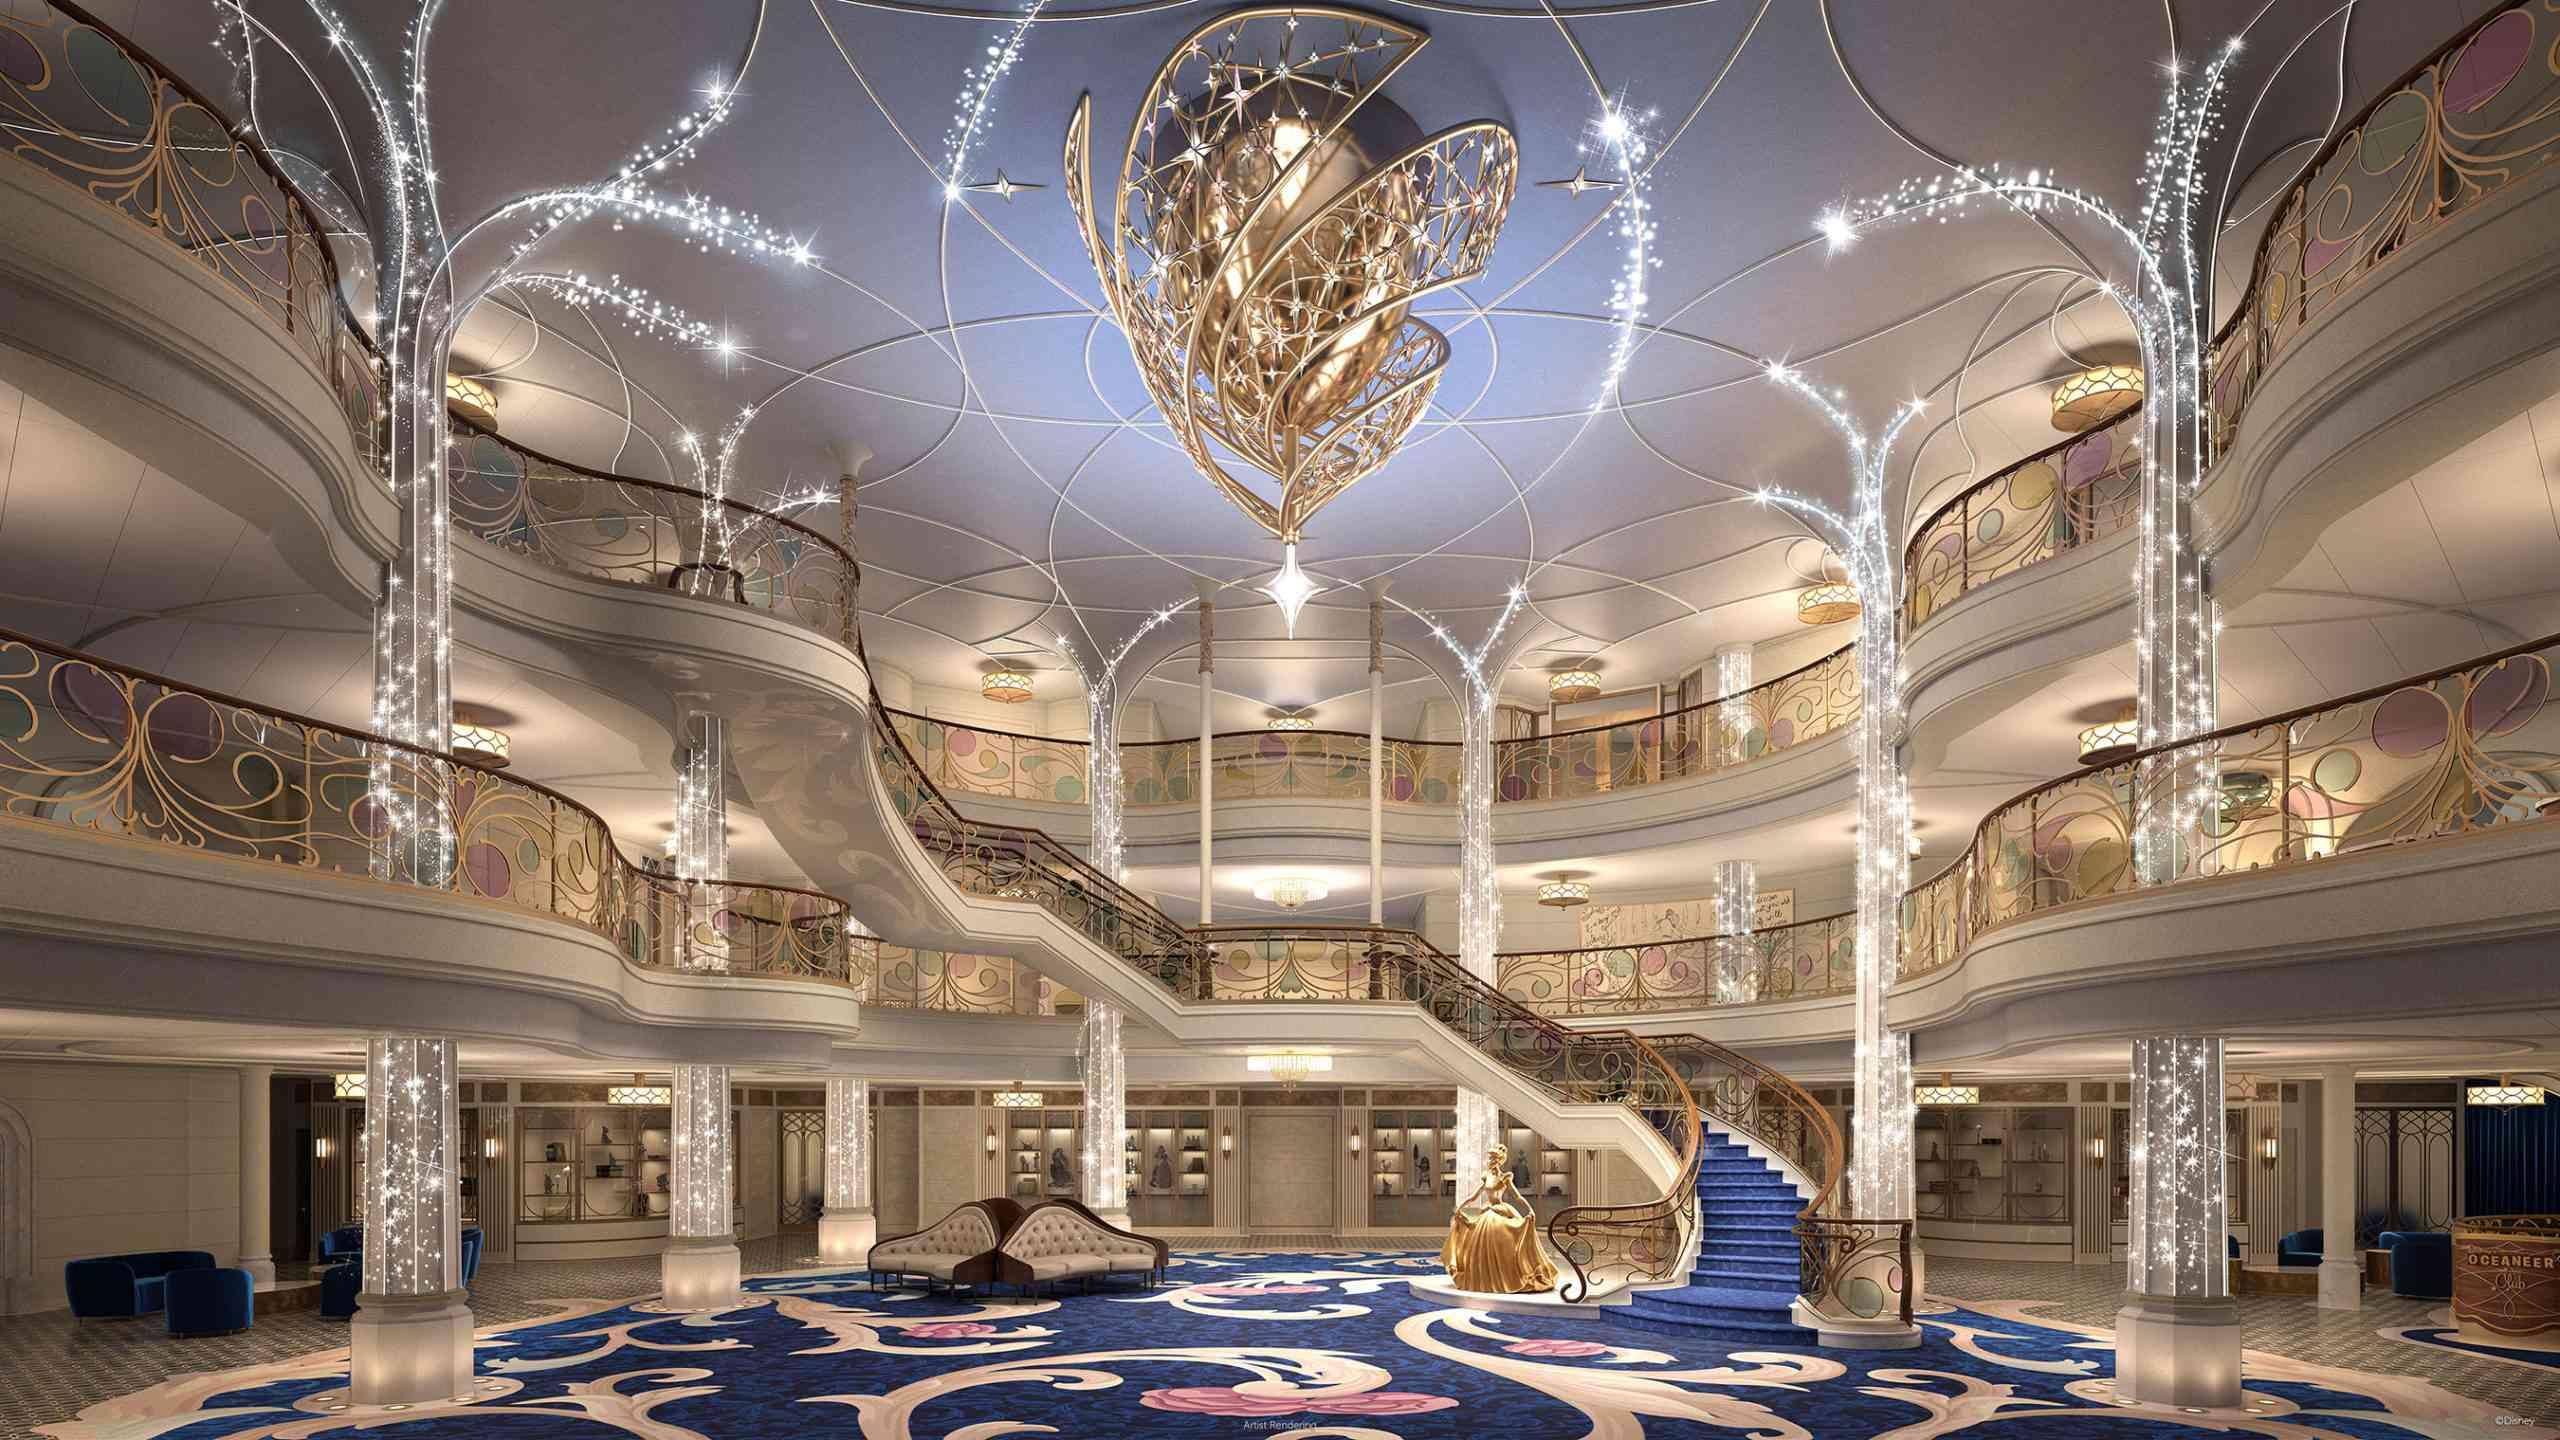 Disney Wish cruise ship Grand Hall